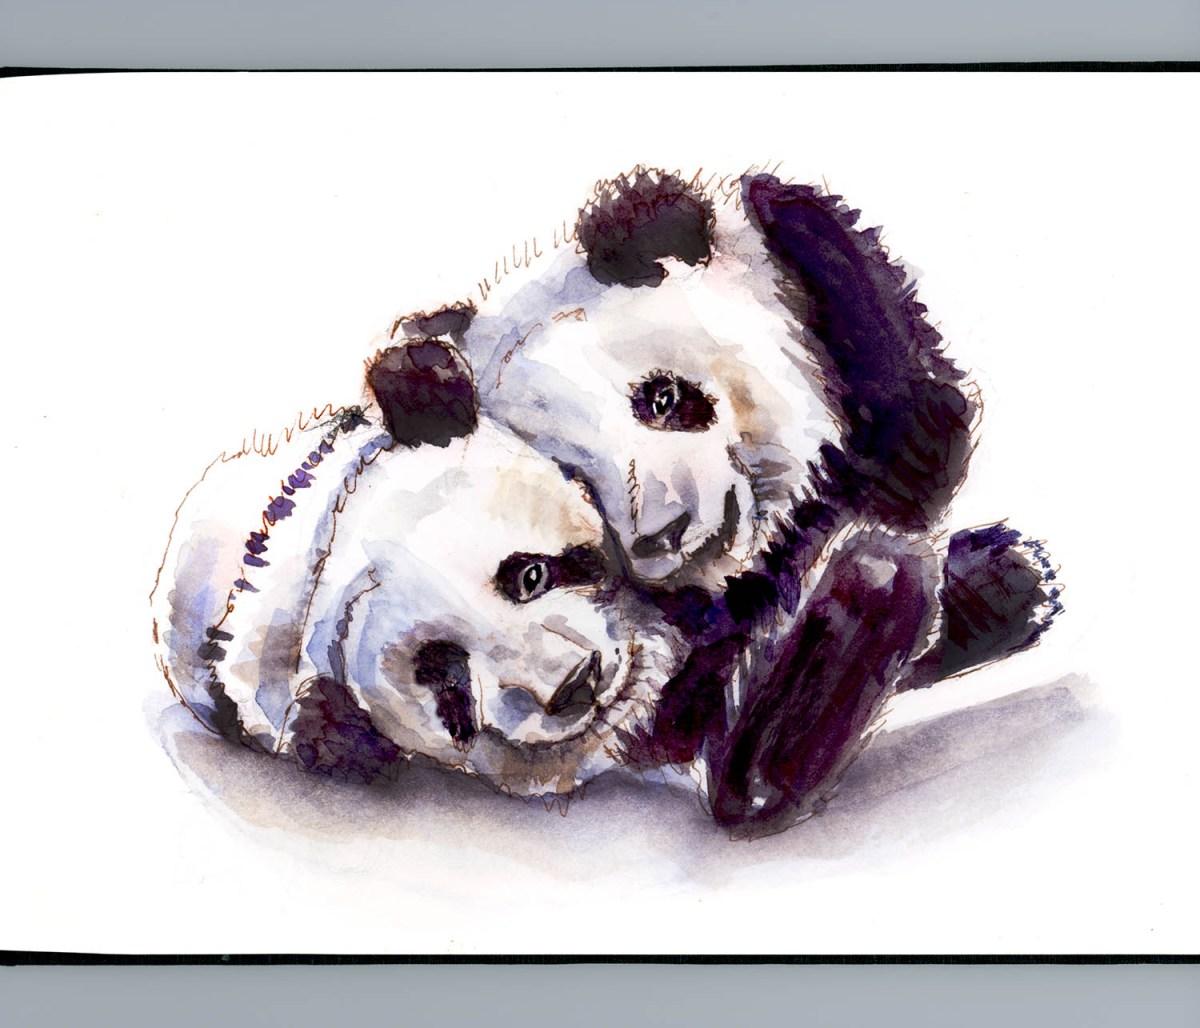 #WorldWatercolorGroup - Day 14 - Giant Panda Love - Doodlewash